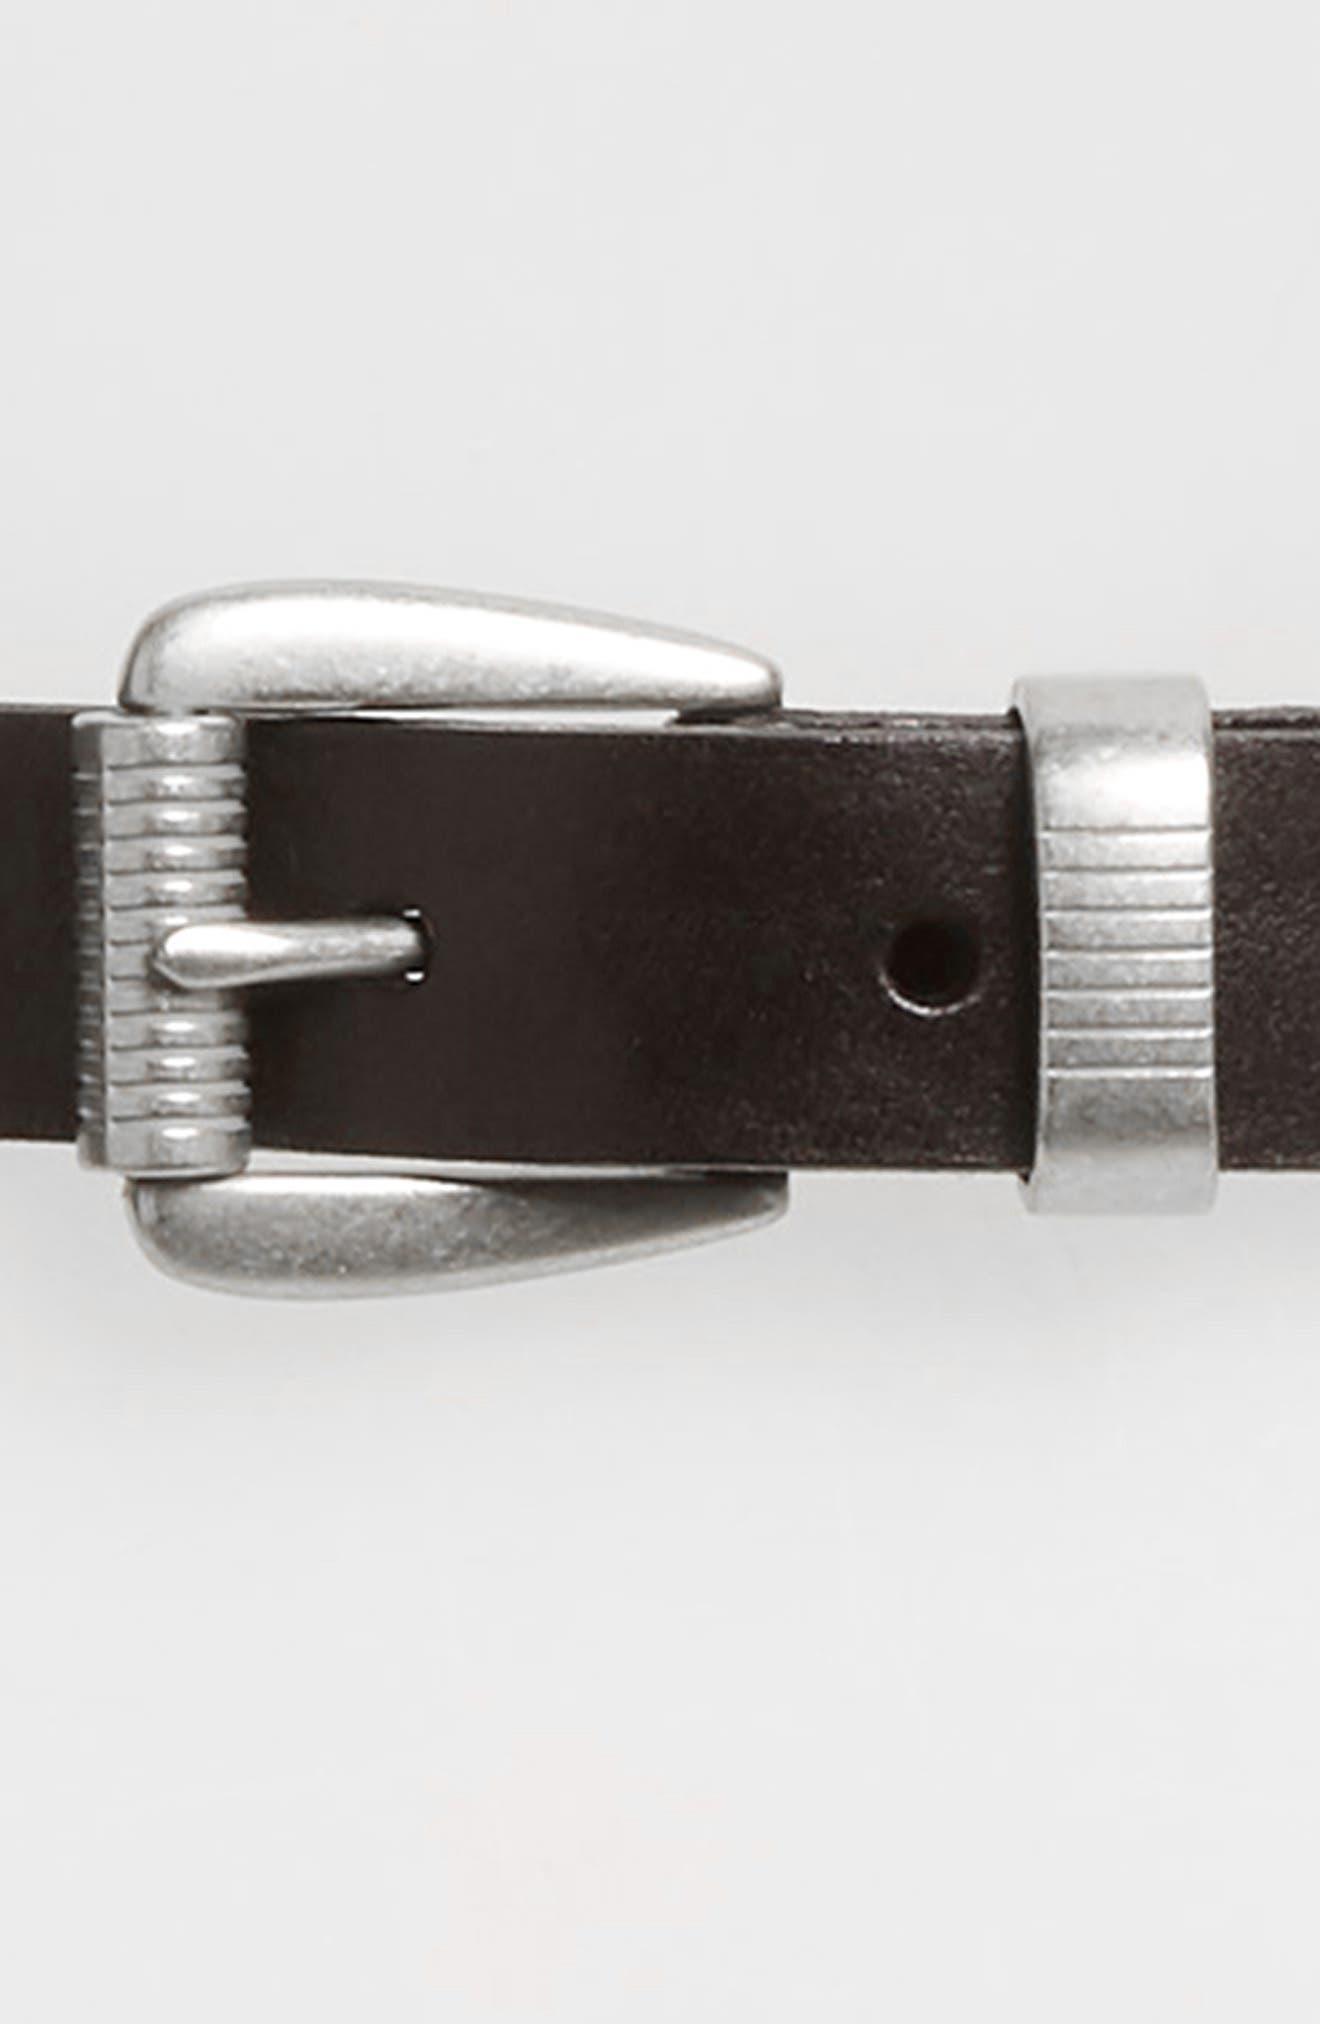 MADEWELL, Leather Three-Piece Belt, Alternate thumbnail 3, color, TRUE BLACK